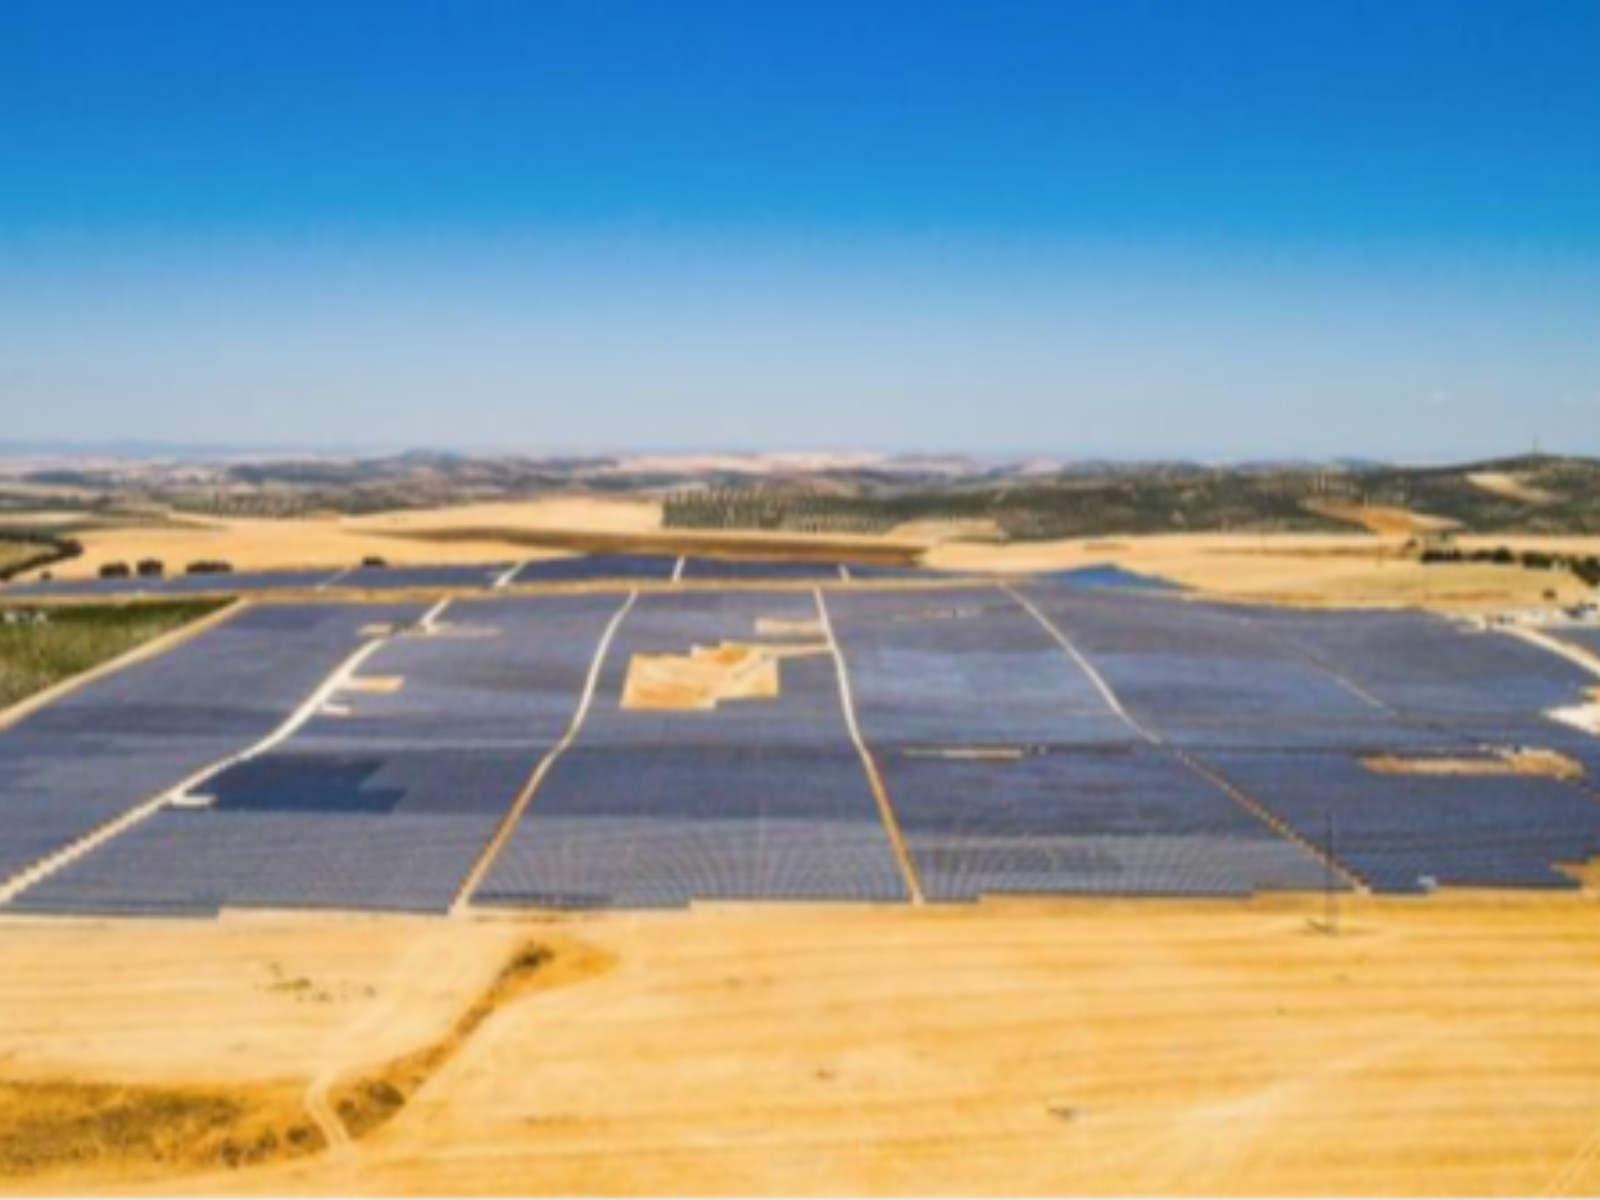 Estructura fotovoltaica de suelo